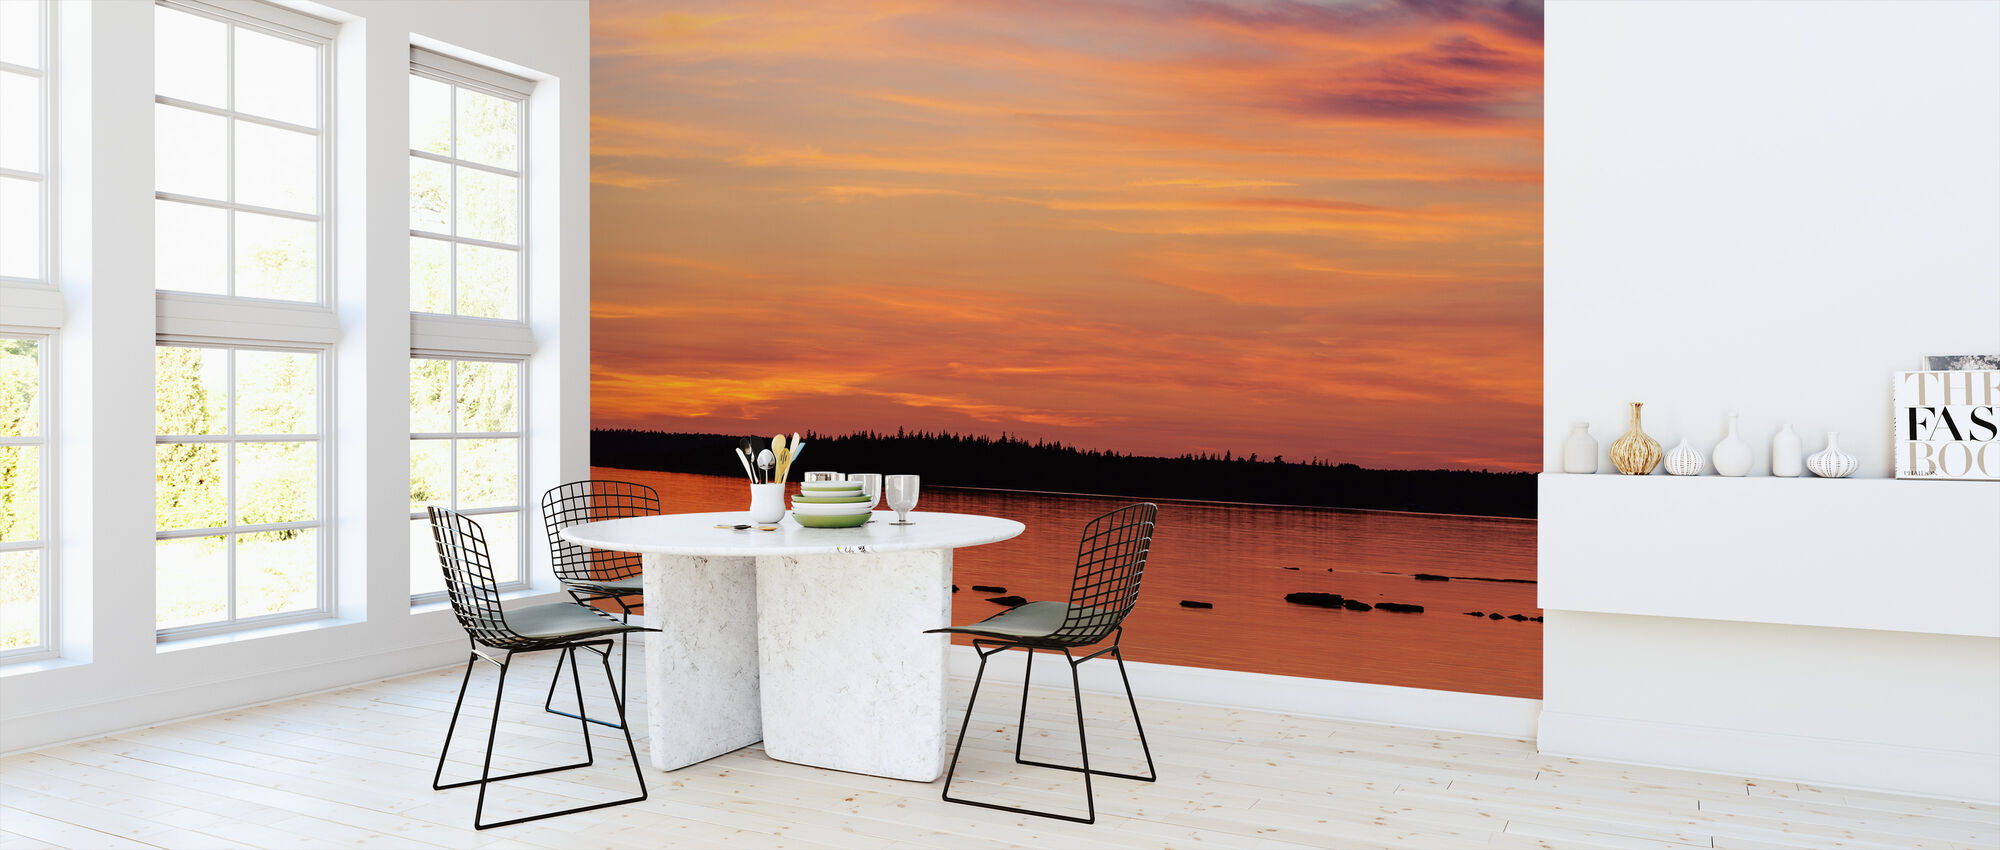 Sunset, Gotland - Wallpaper - Kitchen